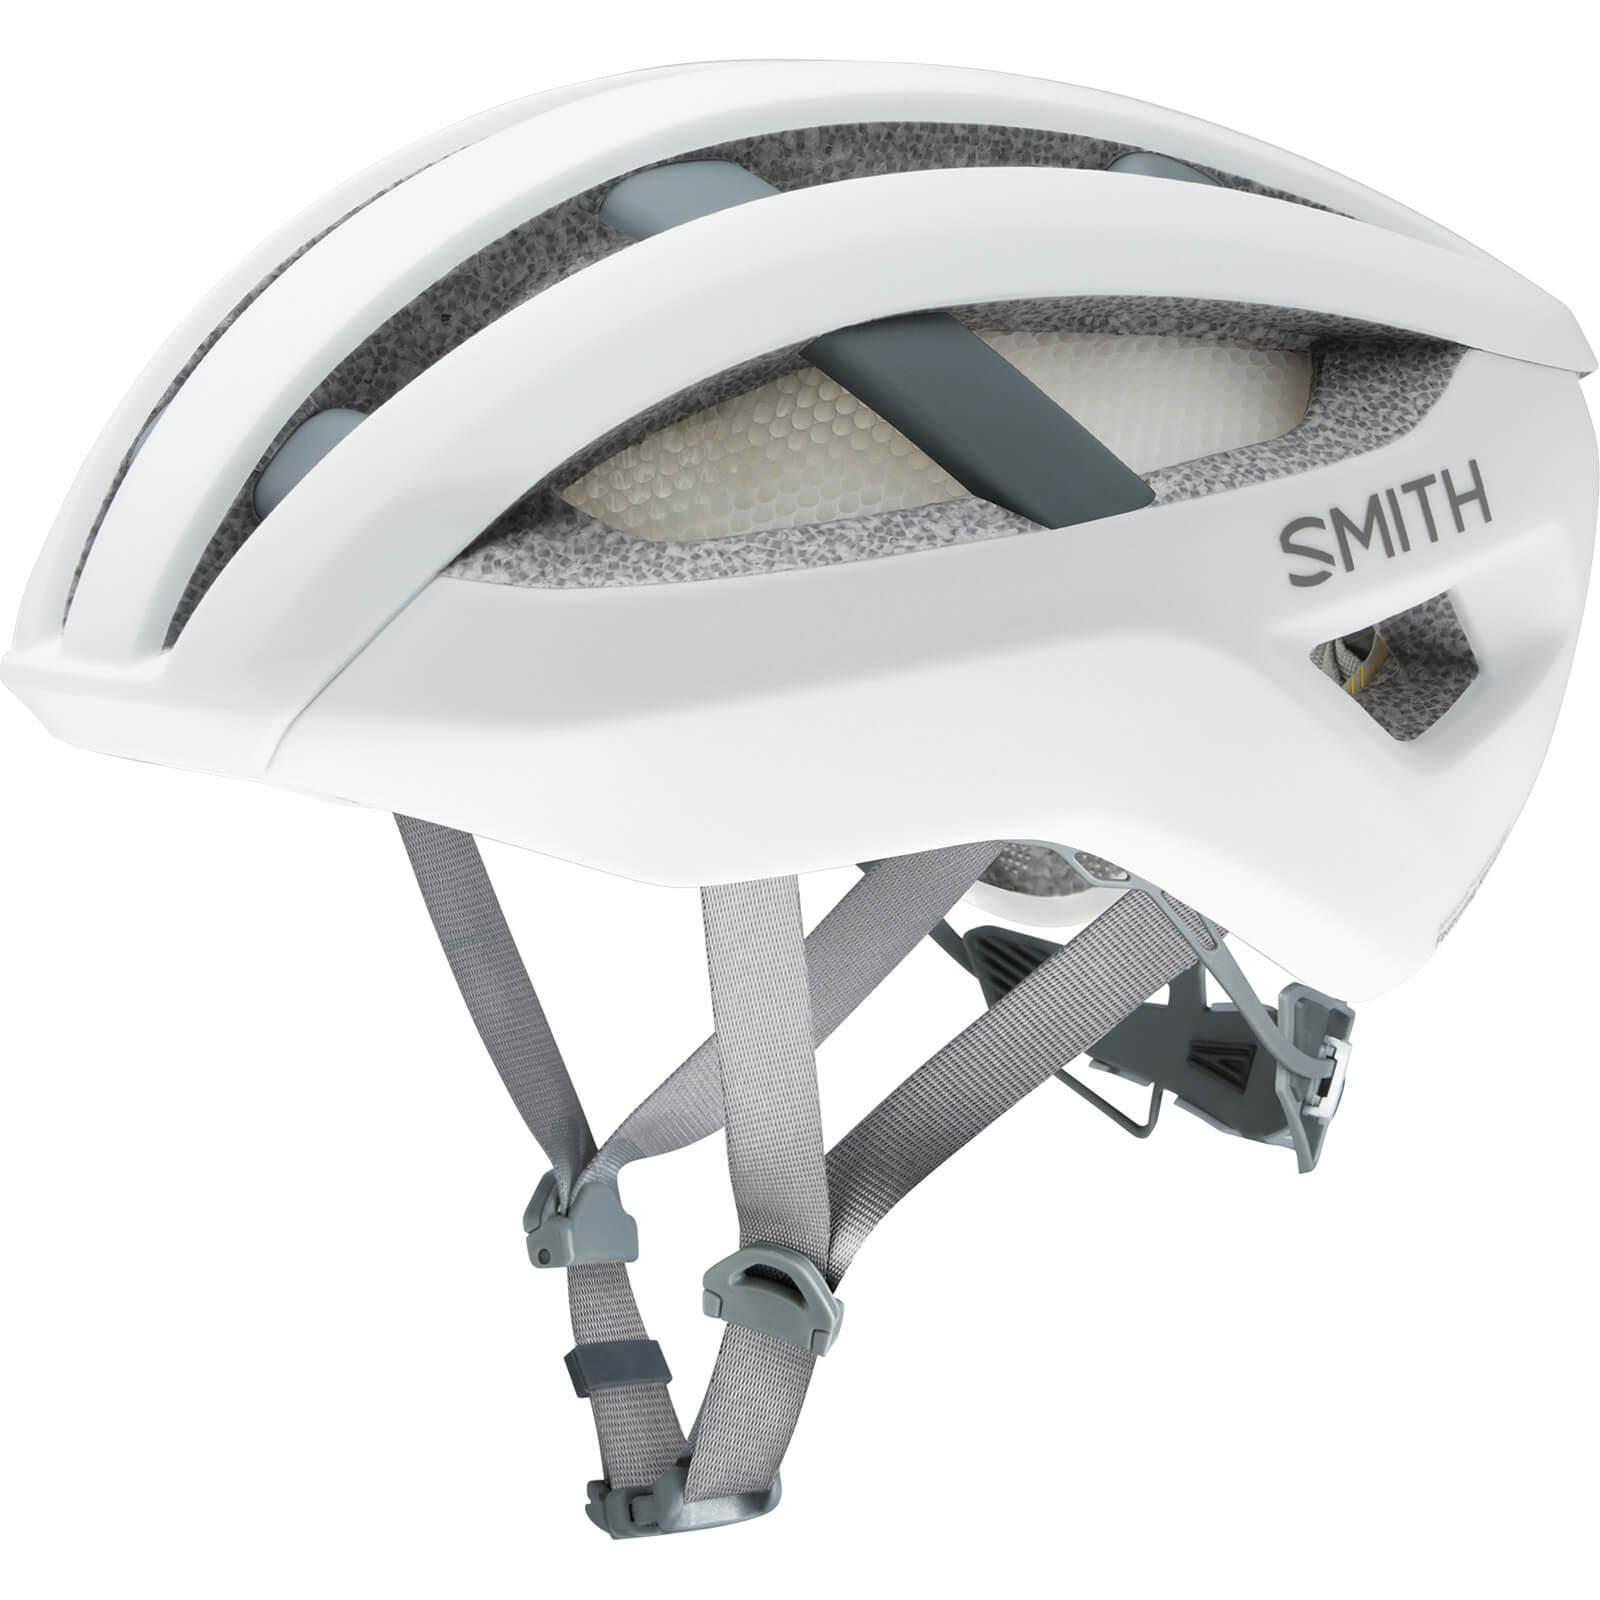 Smith Network MIPS Road Helmet - Small - Matte White; unisex